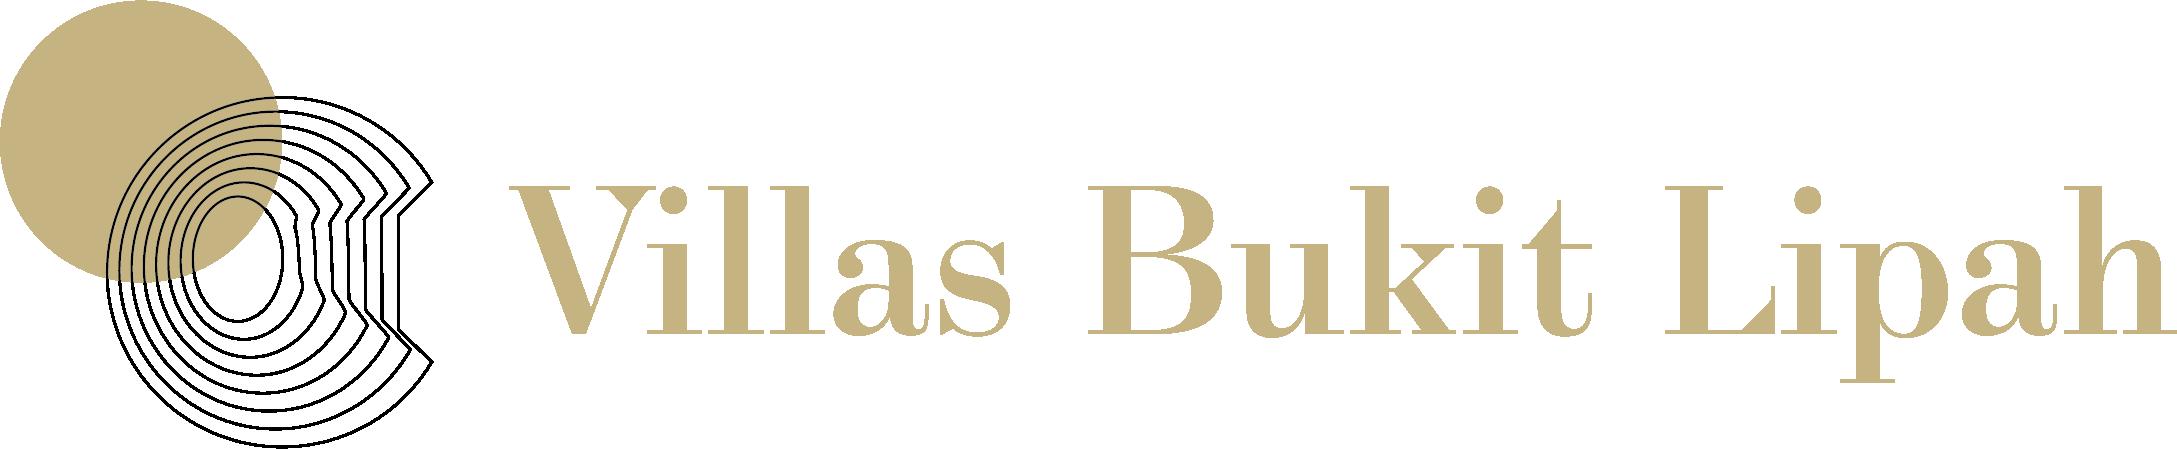 VillasBukitLipah Villas Complex Bali Logo